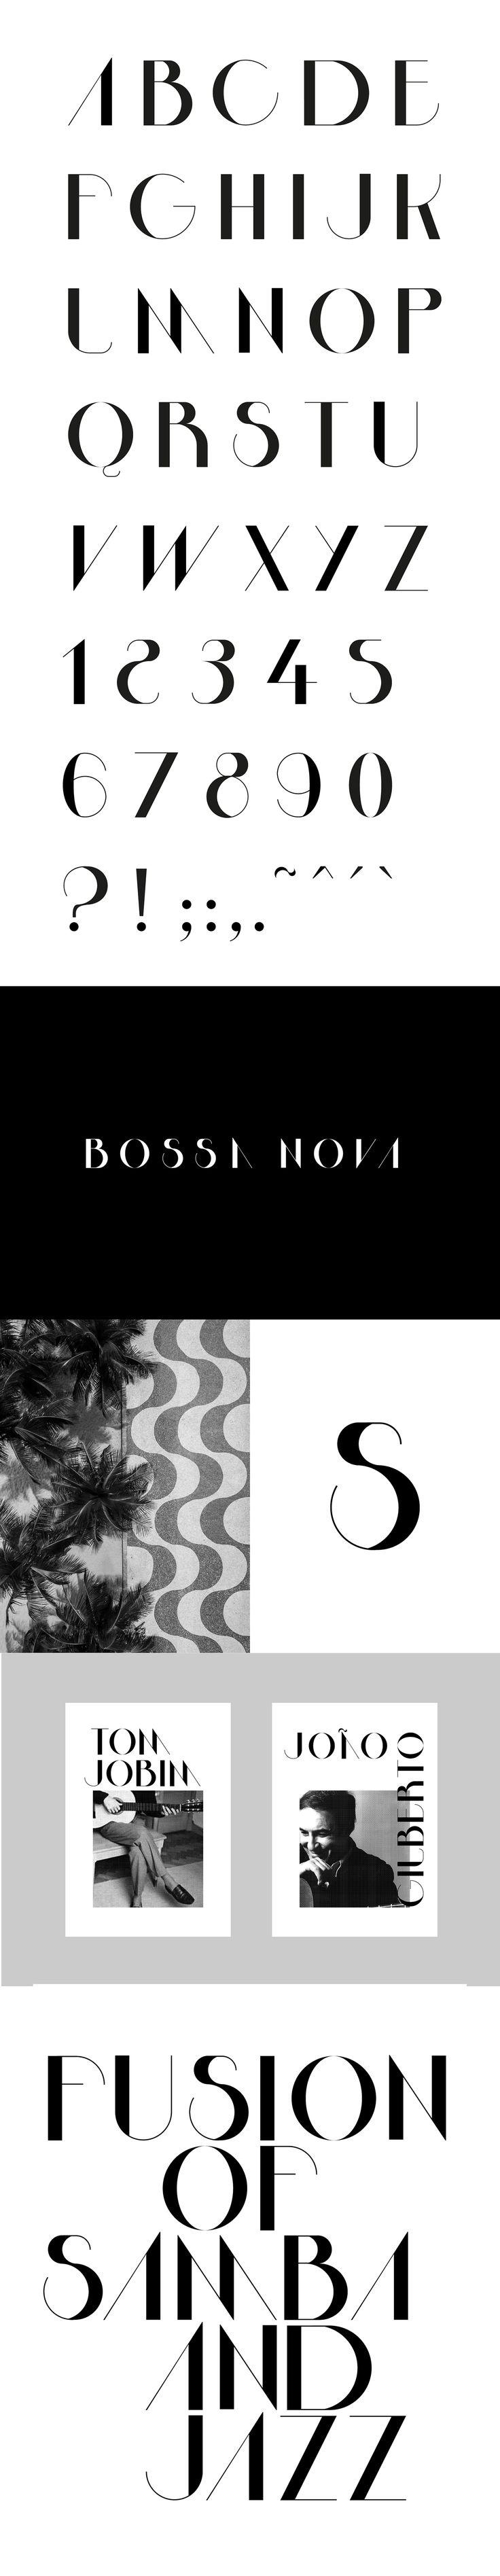 Bossa Nova Font on Behance